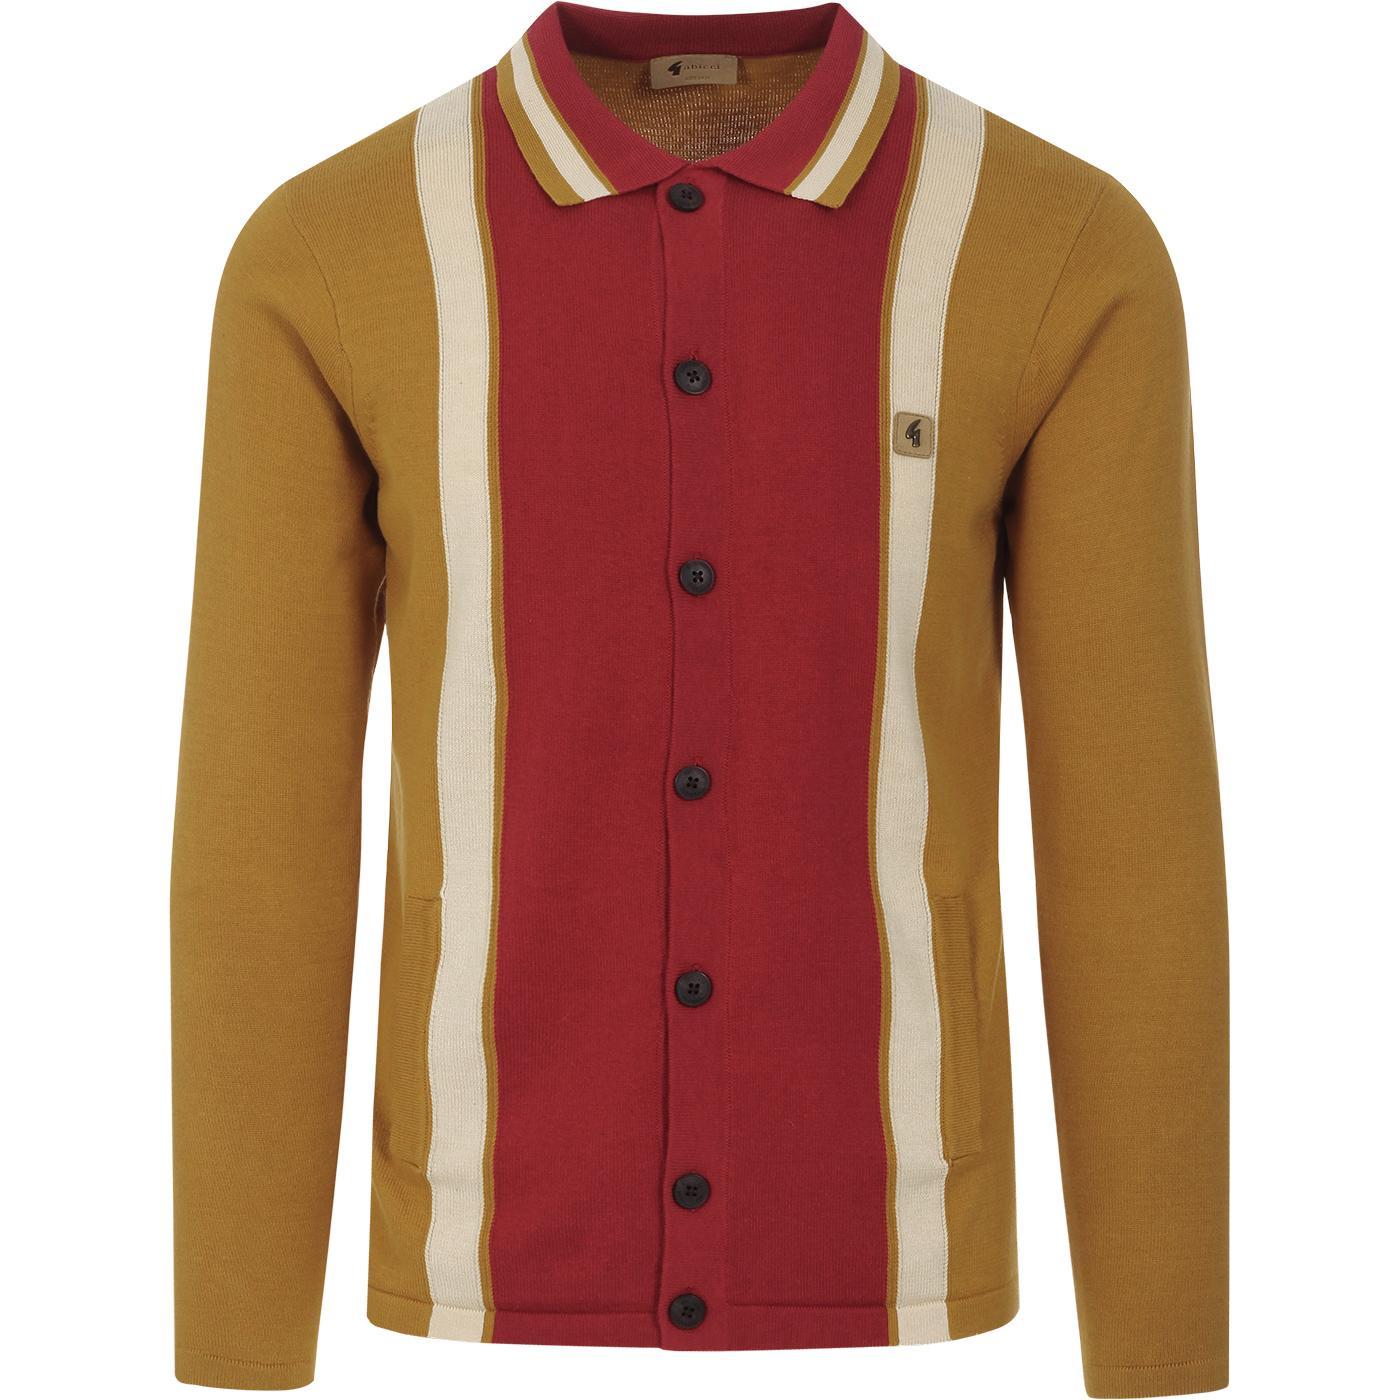 Davison GABICCI VINTAGE Mod Knit Polo Cardigan (H)